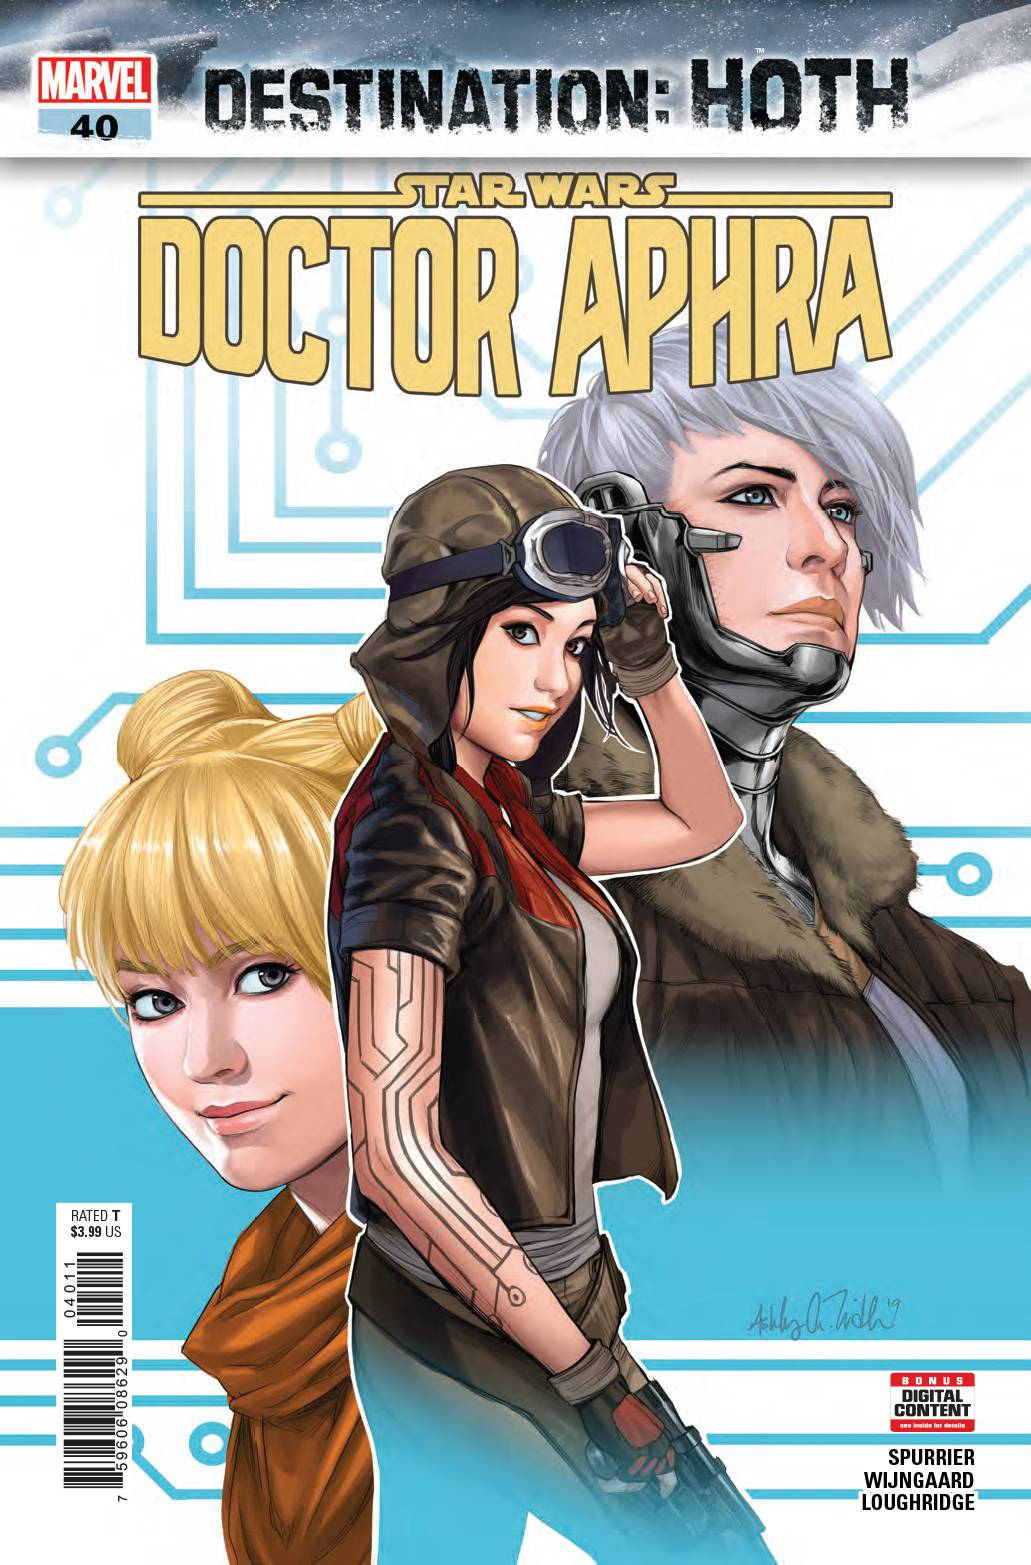 Star Wars Doctor Aphra #40